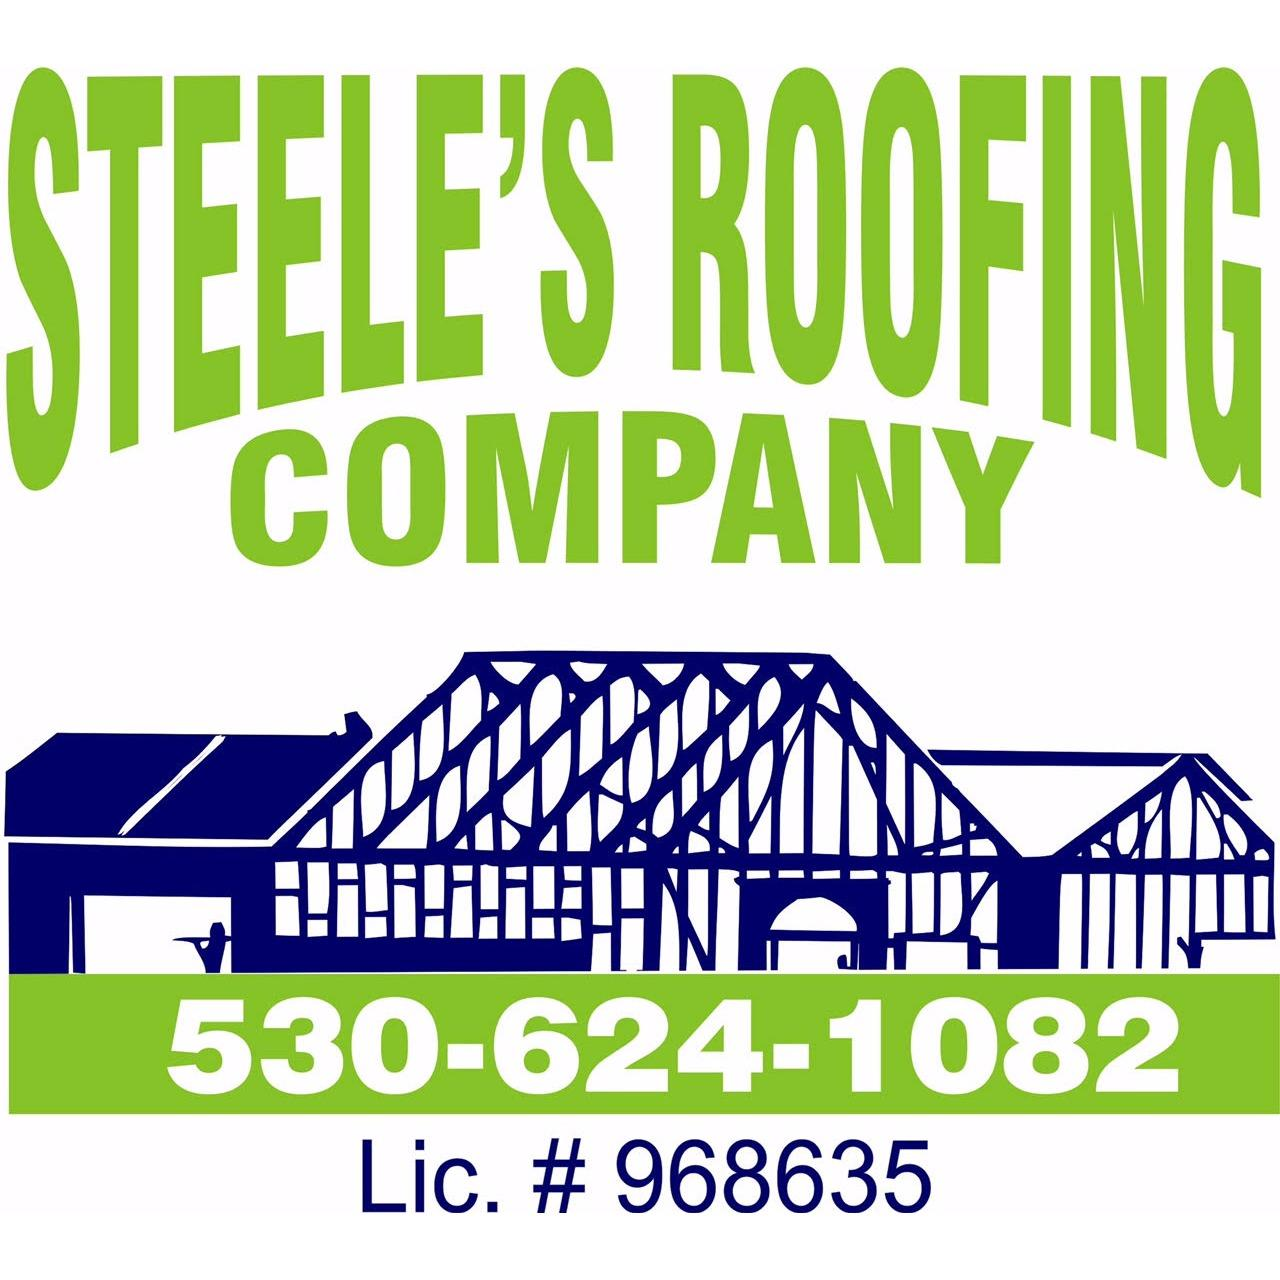 Steele's Roofing Company